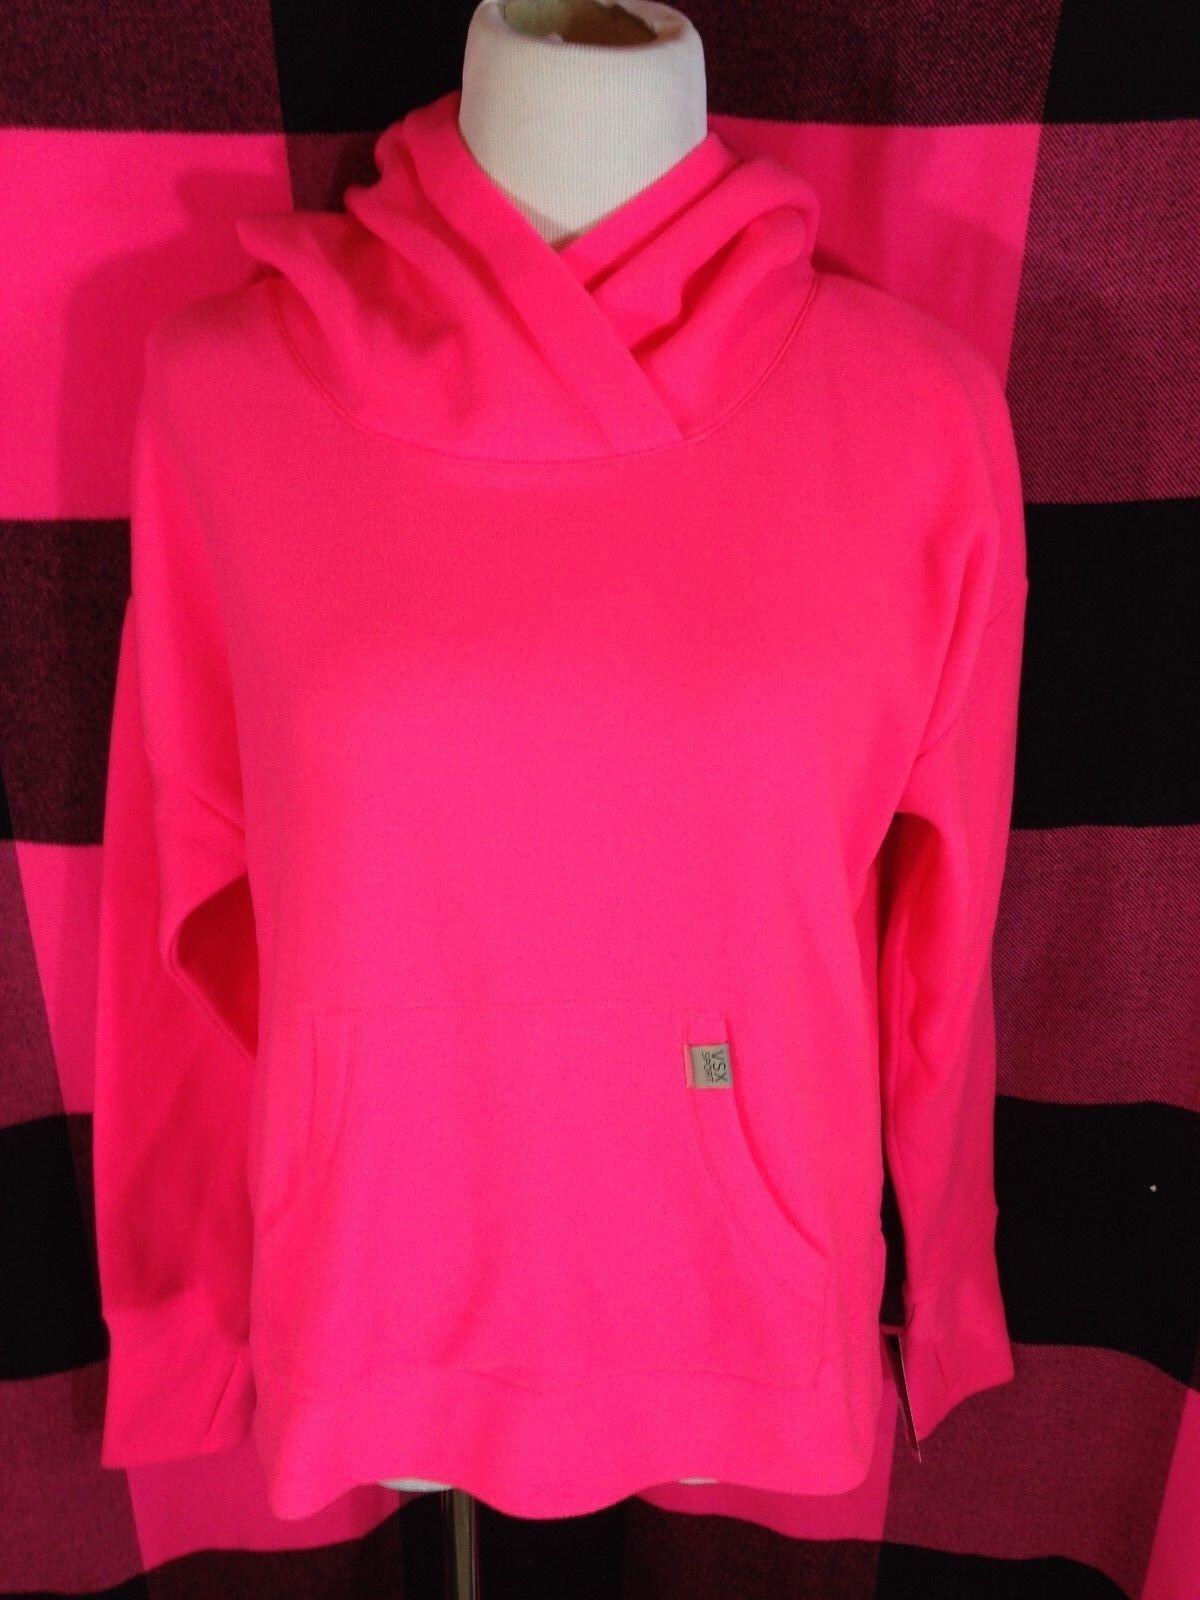 Victoria's Secret VSX Sport Pink Pink Pink Fleece Running Hoodie Athletic Sweatshirt M NWT b4a449